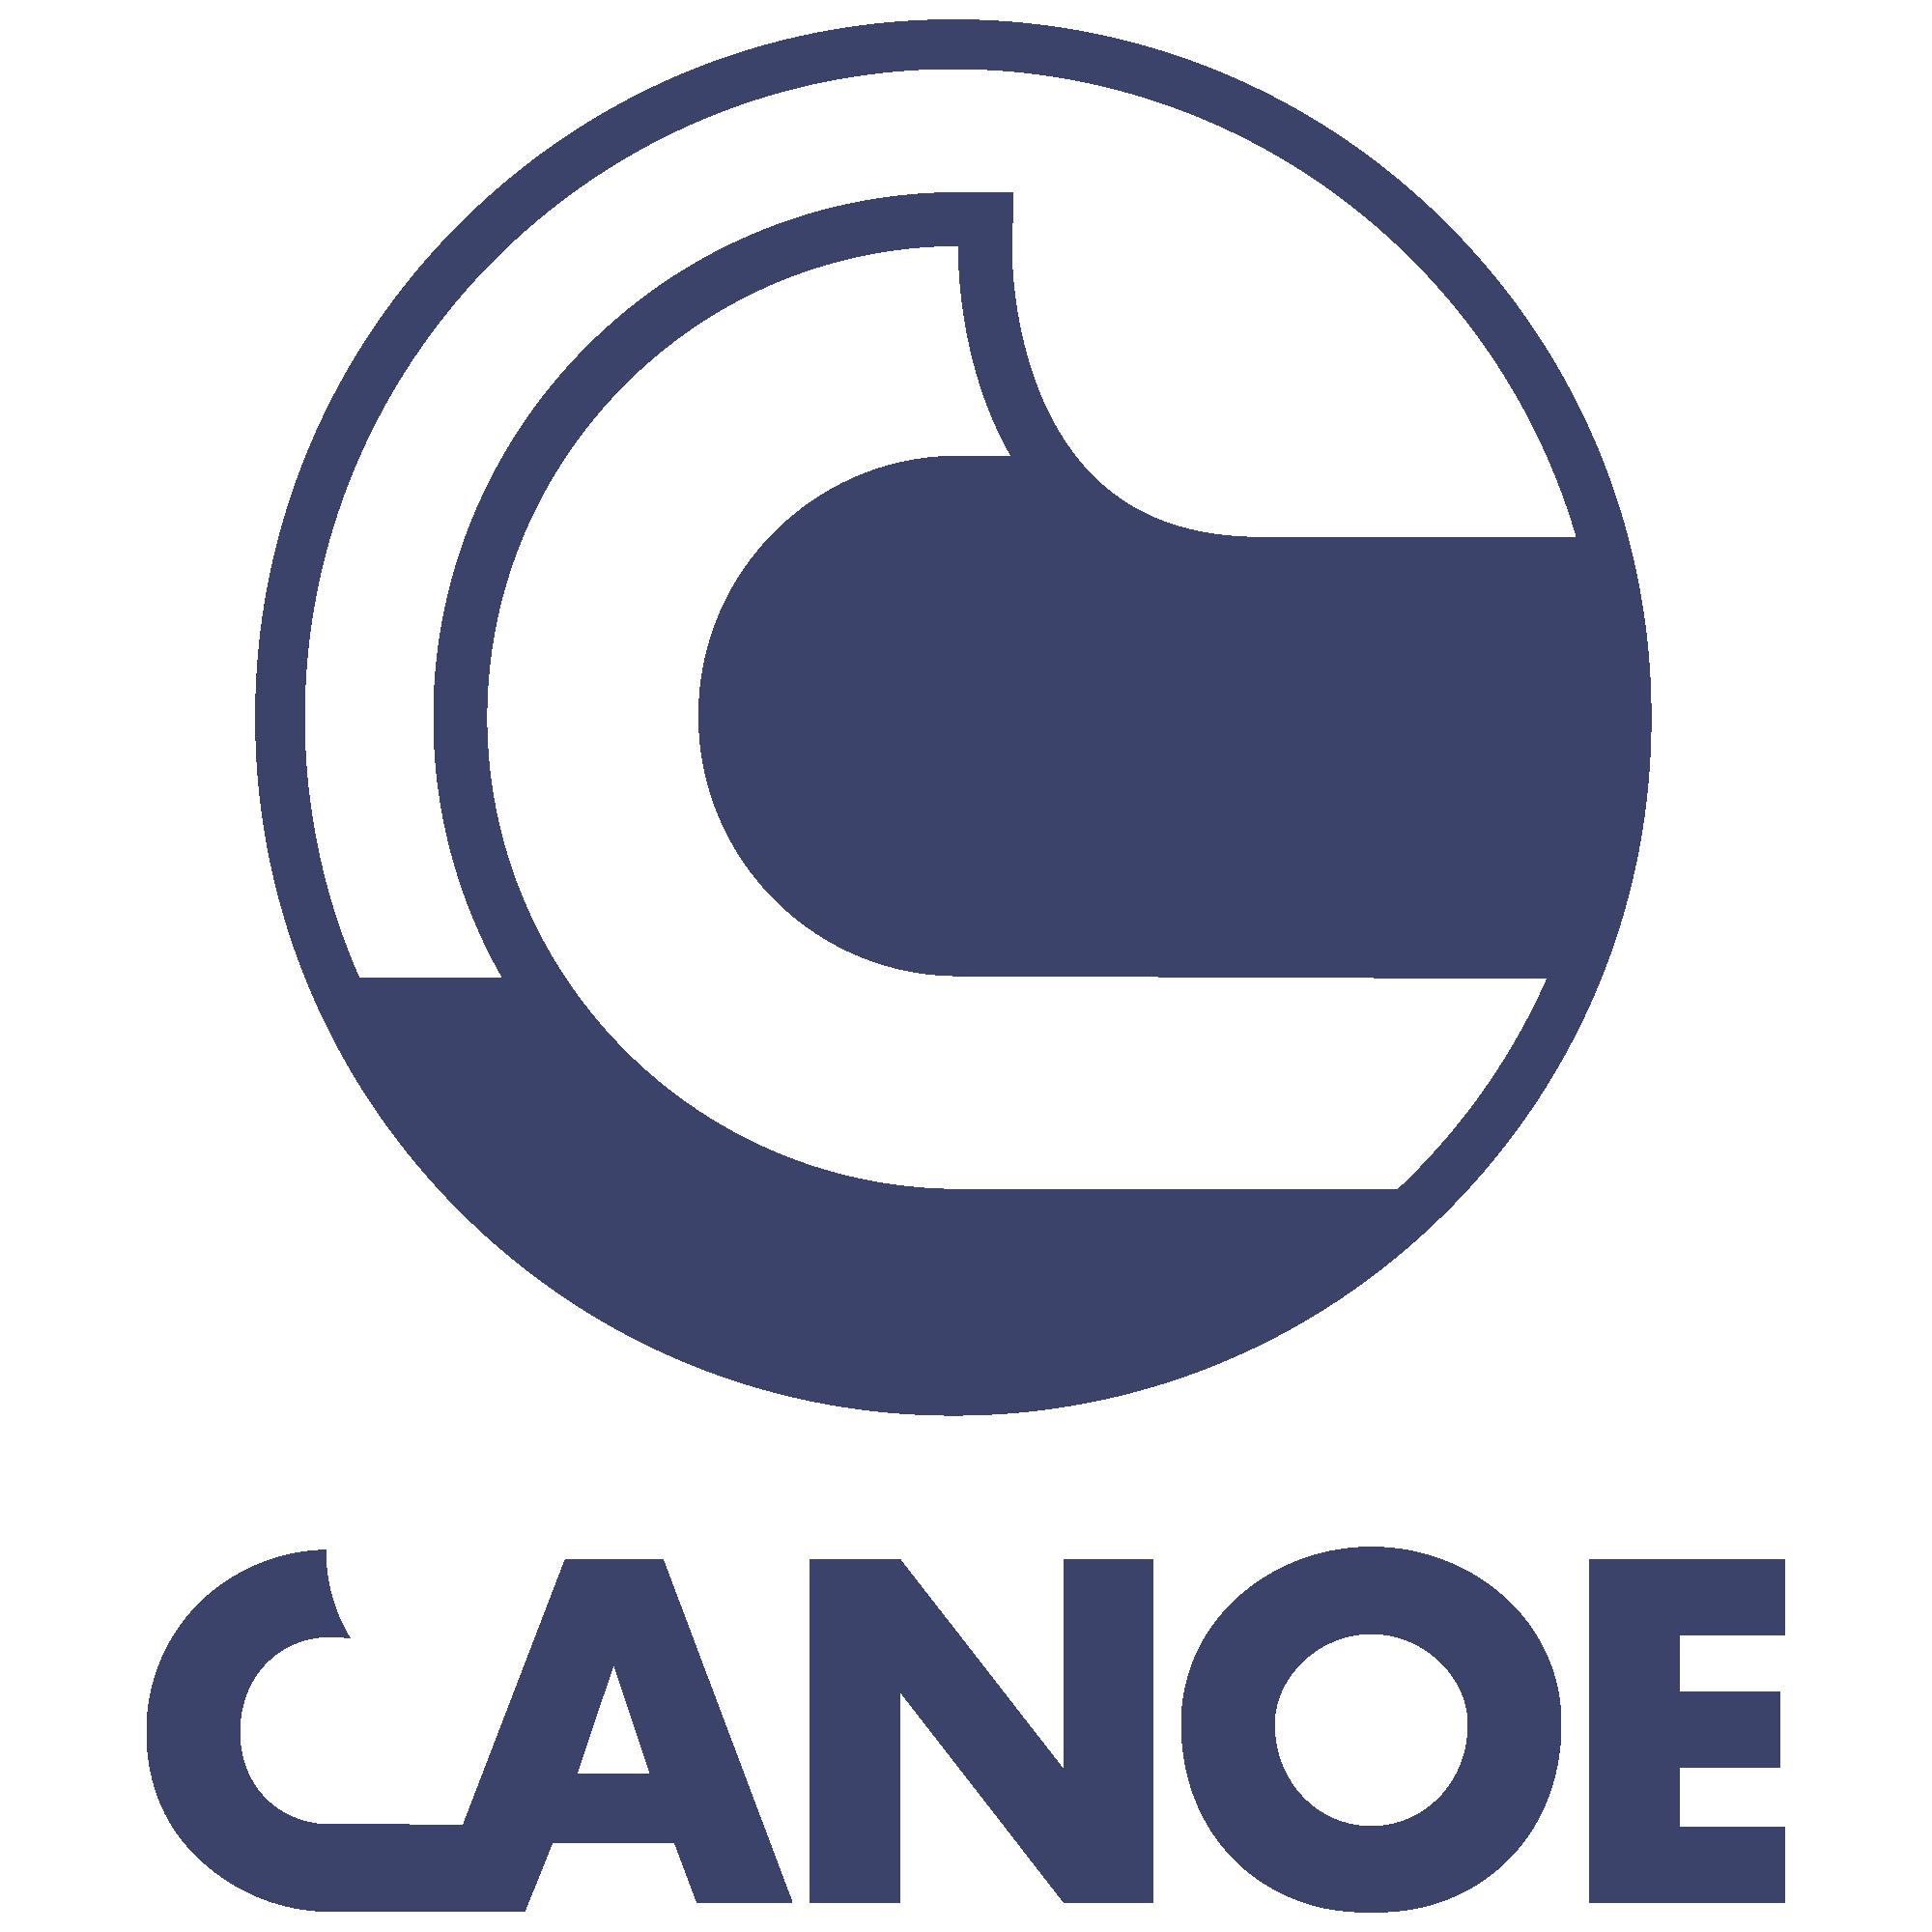 Canoe@2x.png